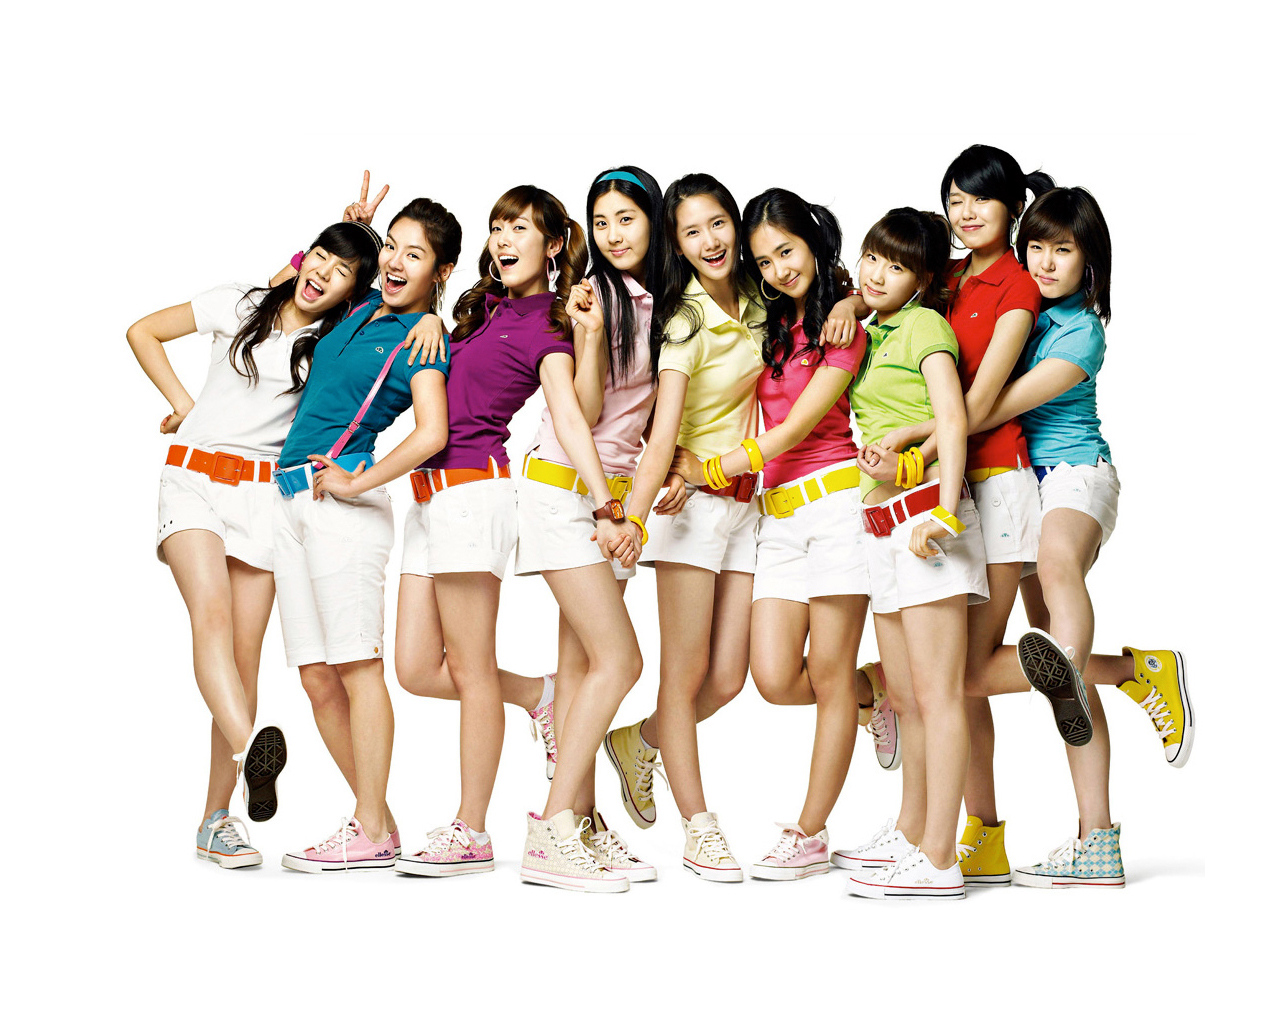 Girl__s_Generation___SNSD___by_1126jjk.jpg